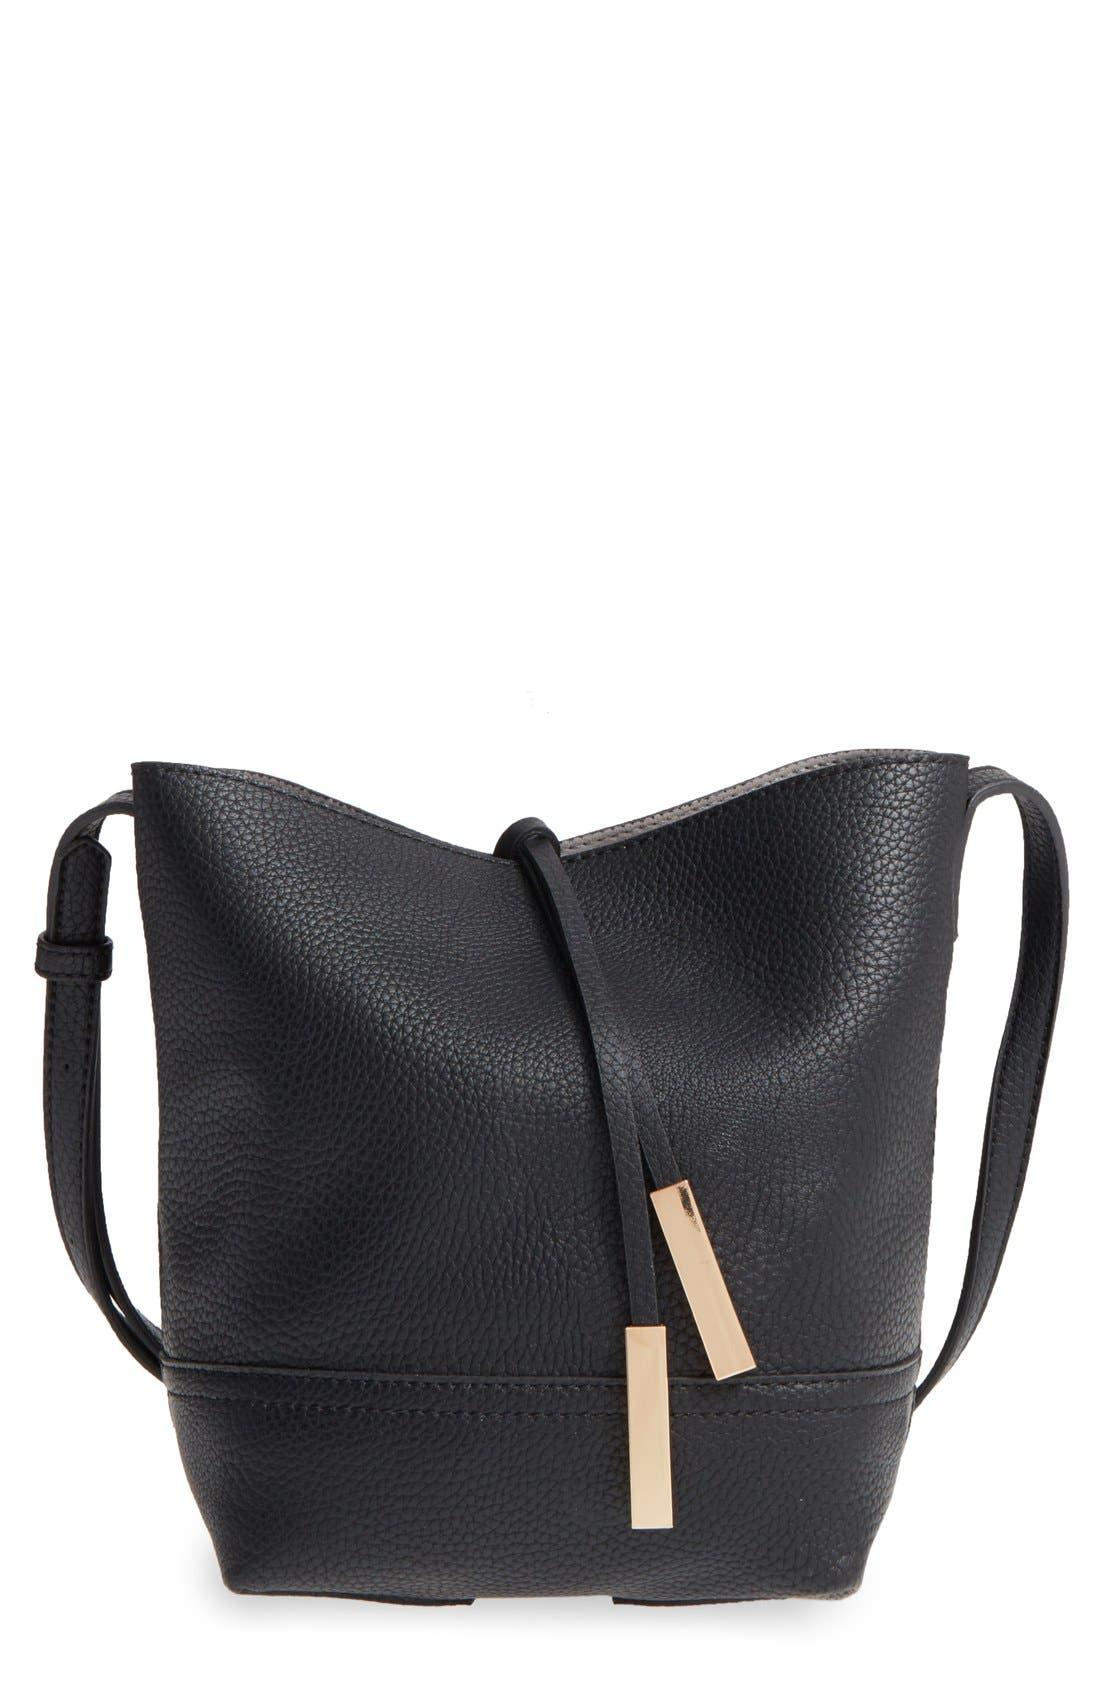 Main Image - Street Level Faux Leather Bucket Bag